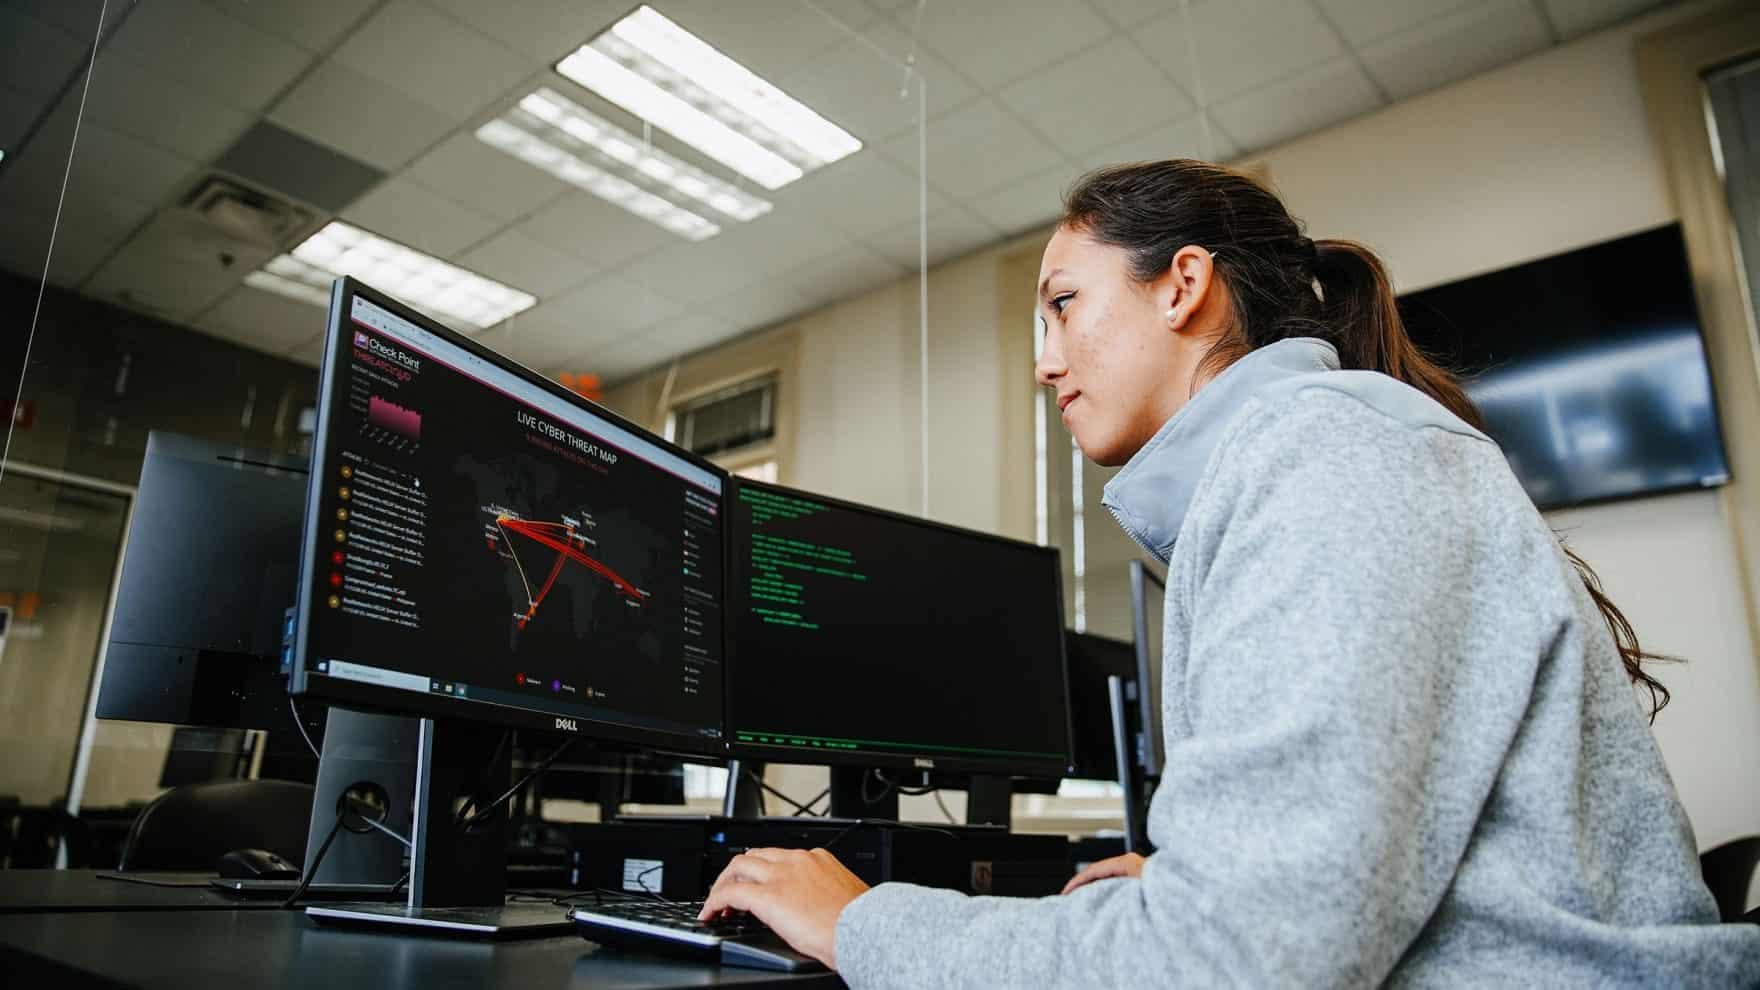 Regent University Institute for Cybersecurity Wins Award